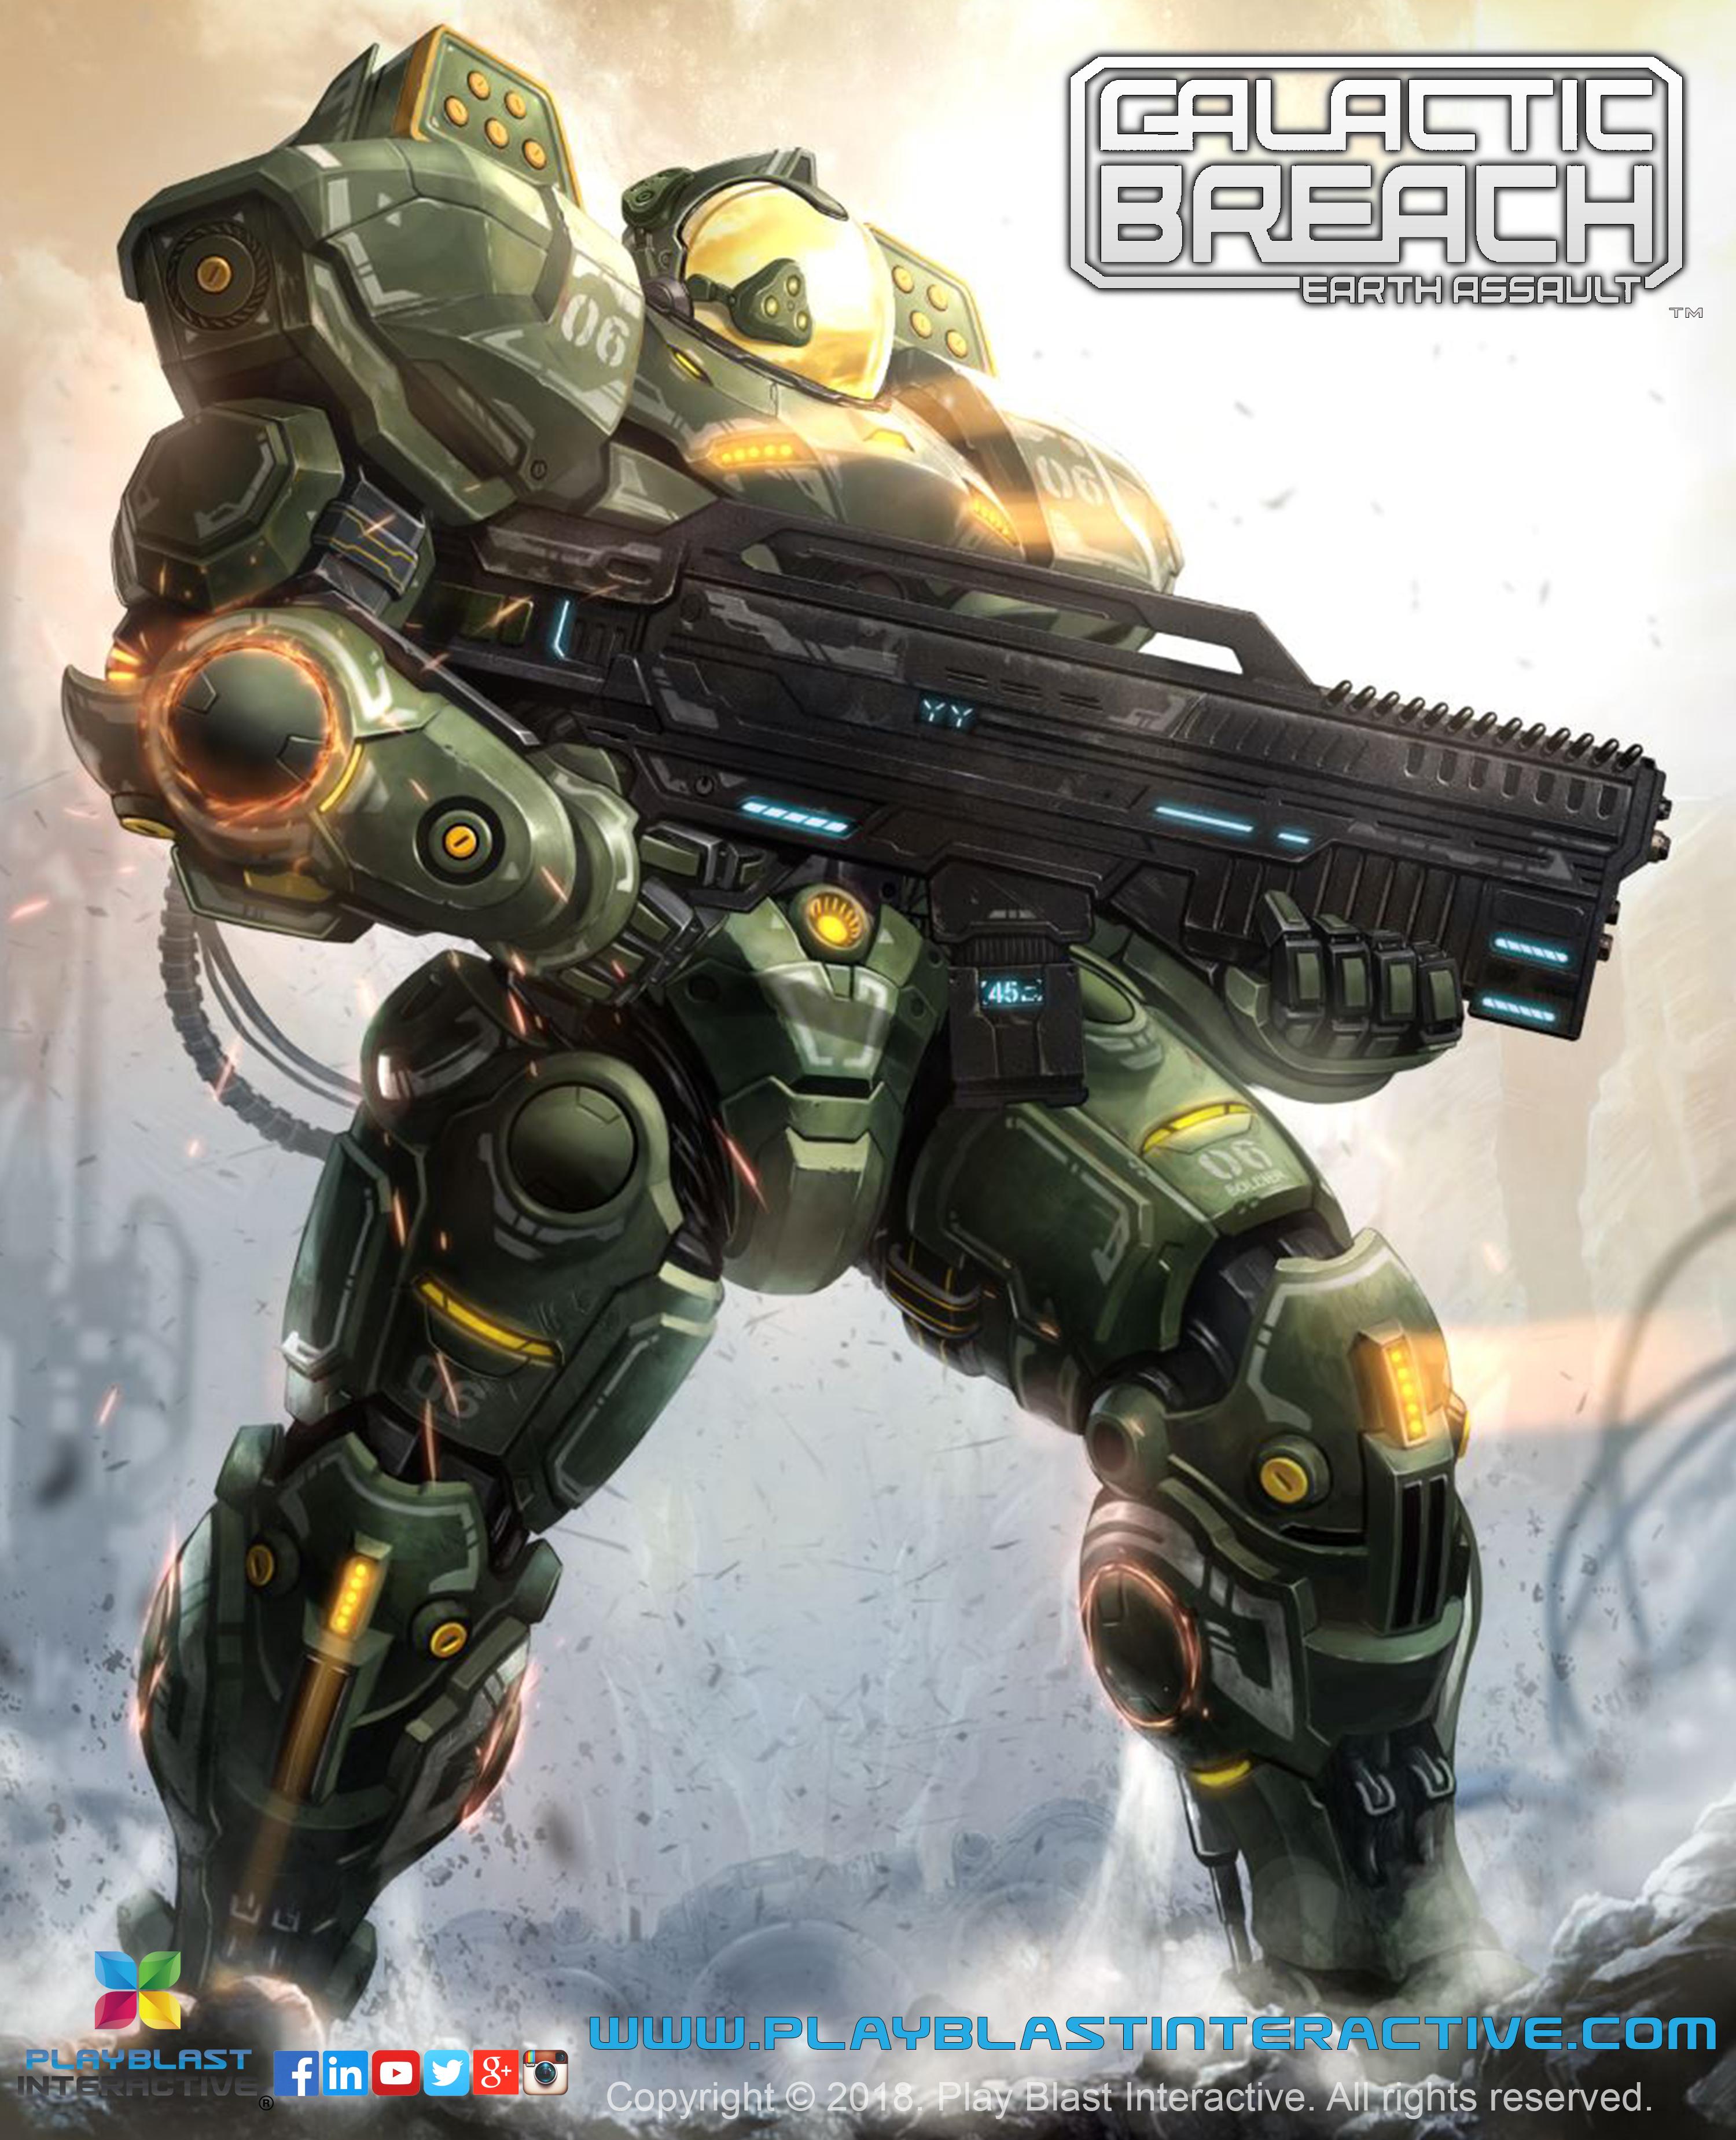 Galactic Breach: Earth Assault. Imperias Space Marine